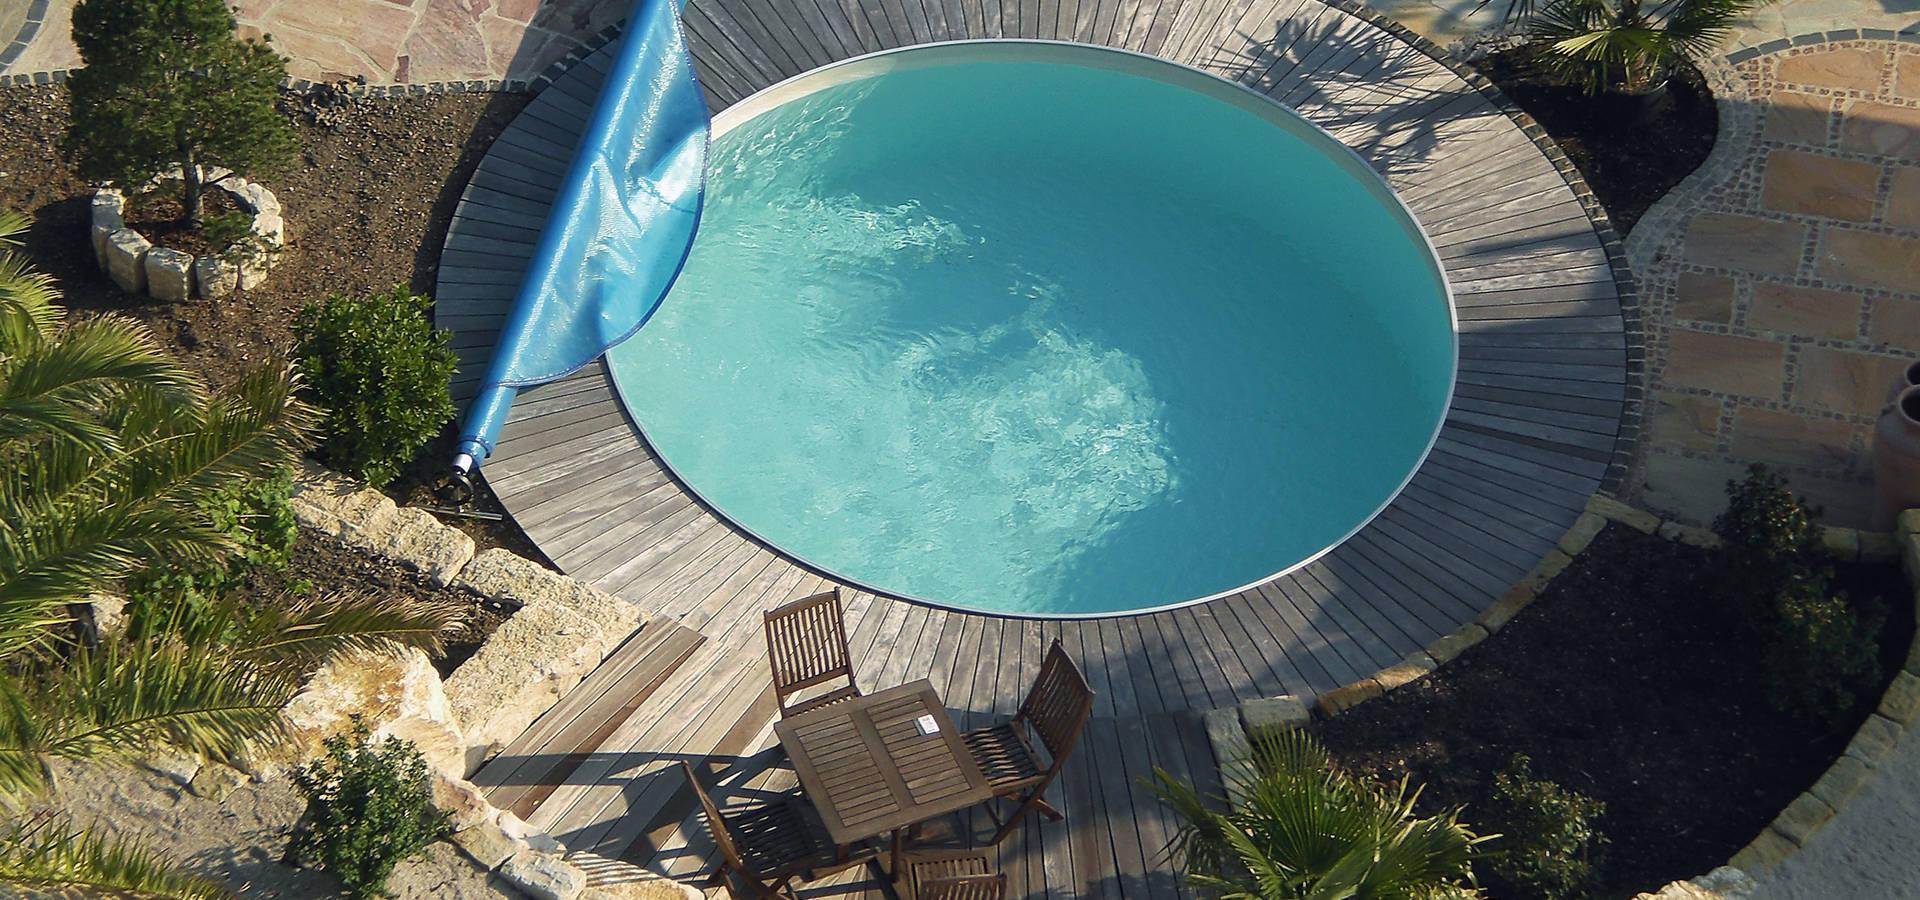 Pool + Wellness City GmbH